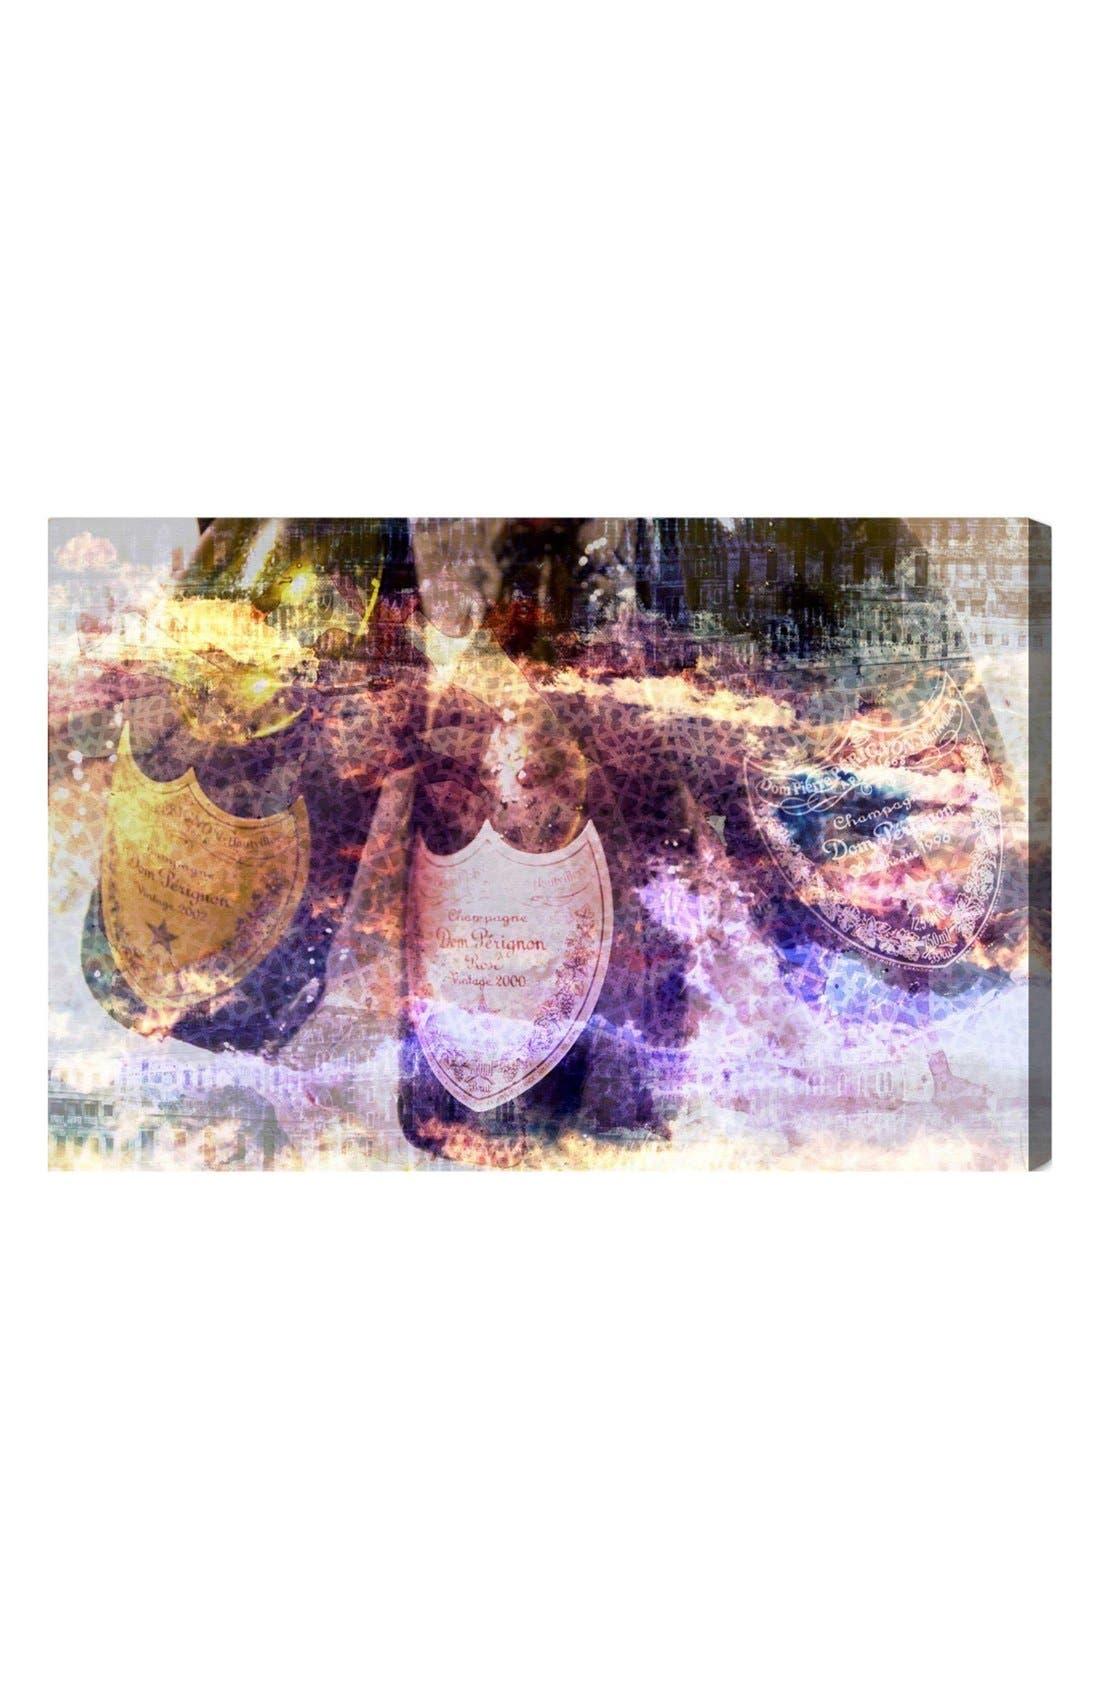 Oliver Gal 'Champagne Bath' Canvas Wall Art